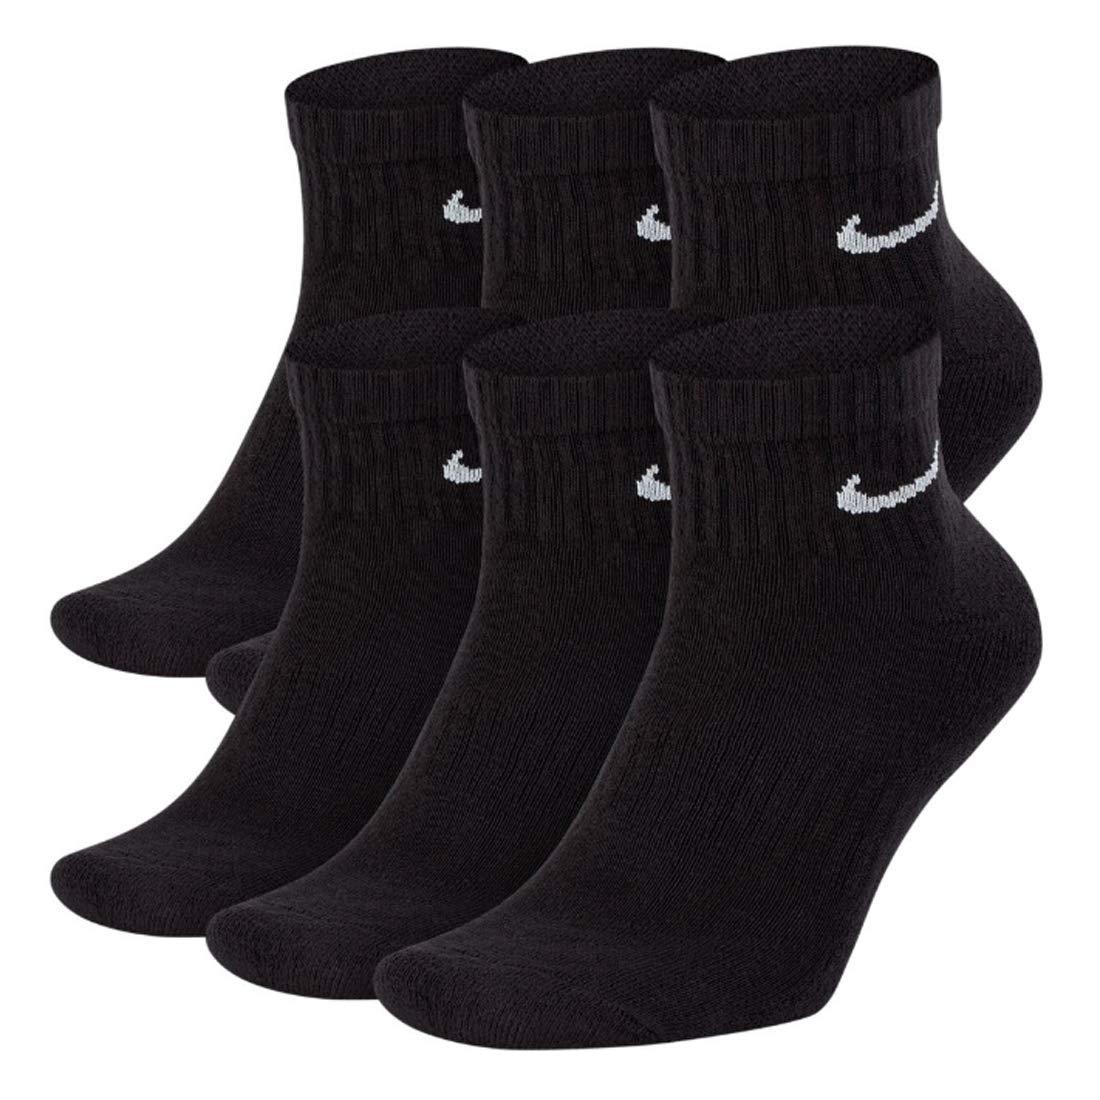 NIKE Everyday Performance Training Socks (6-Pair) (L (Men's 8-12 / Women's 10-13), Ankle(Quarter) Black) by Nike